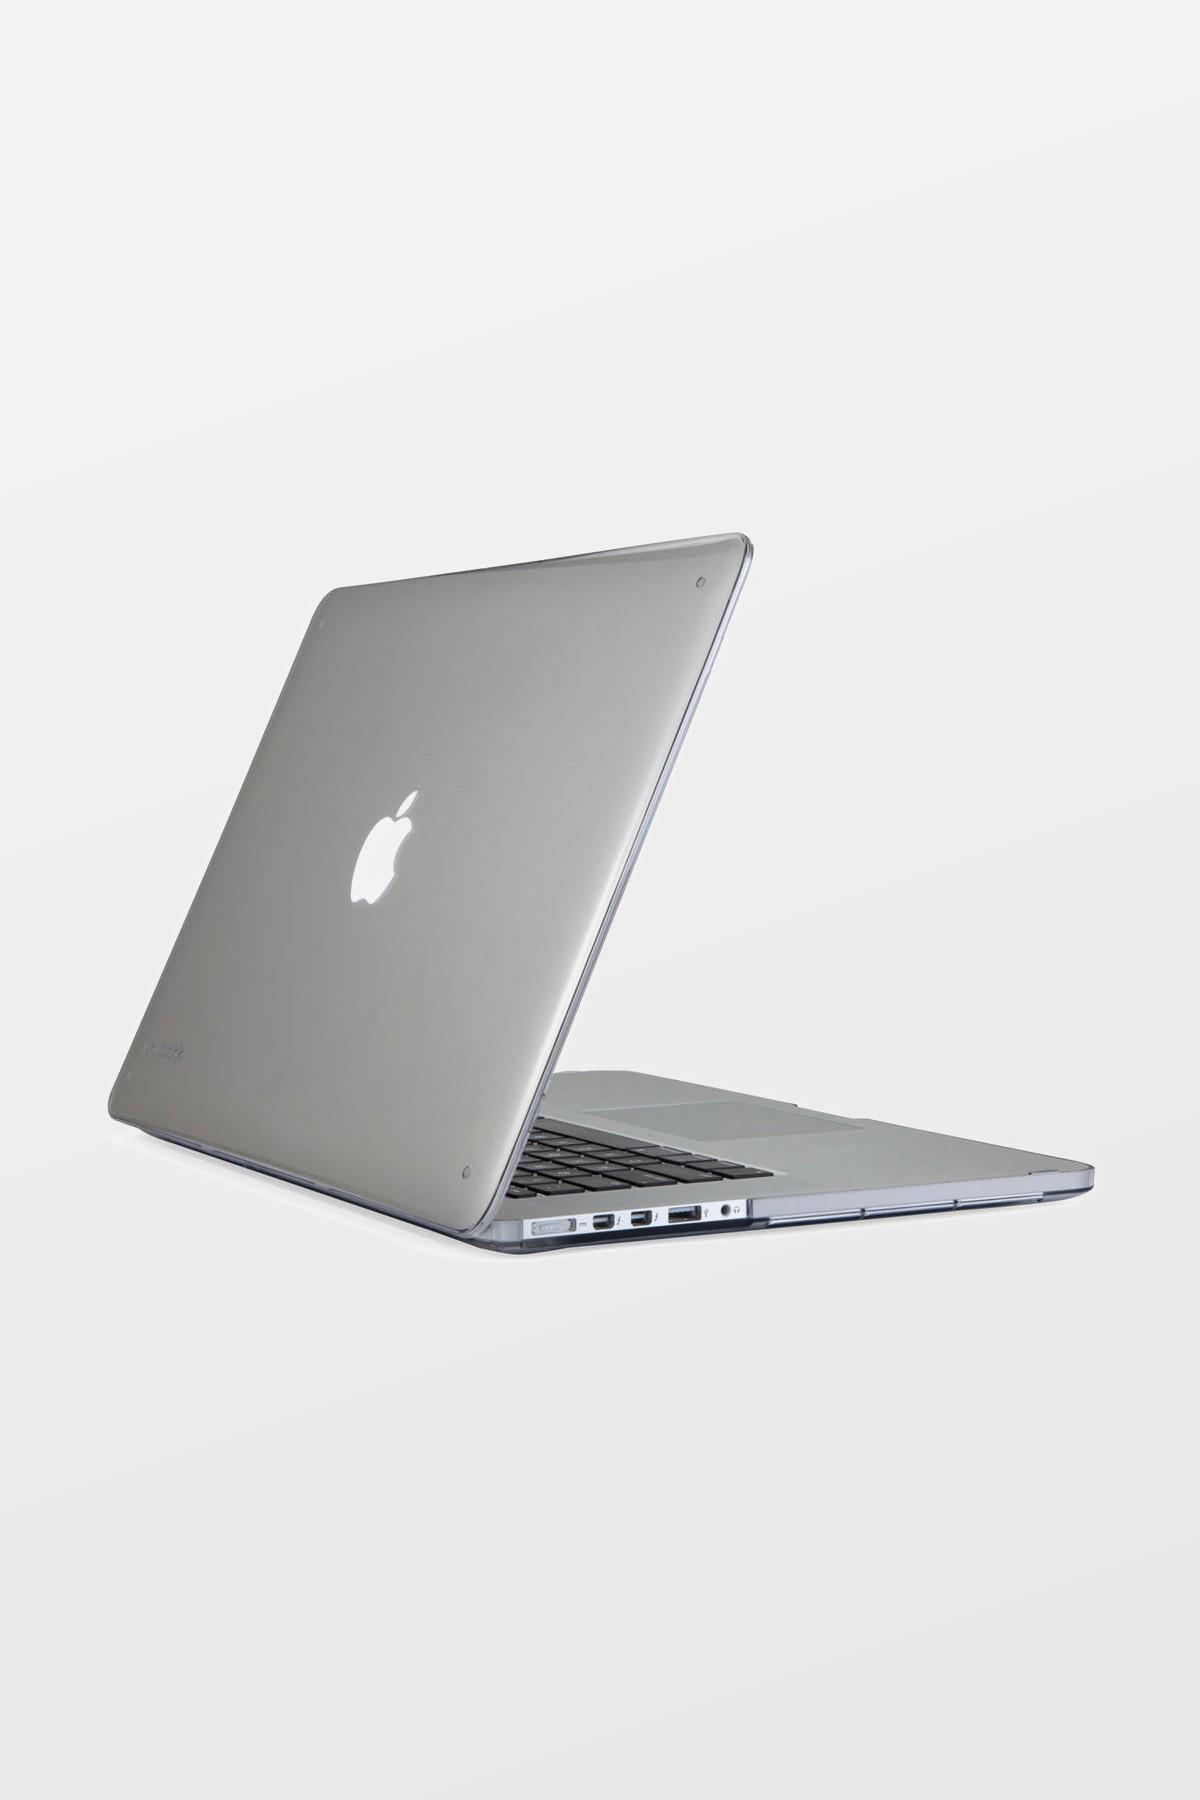 Speck Macbook Pro 15-inch SeeThru Clear